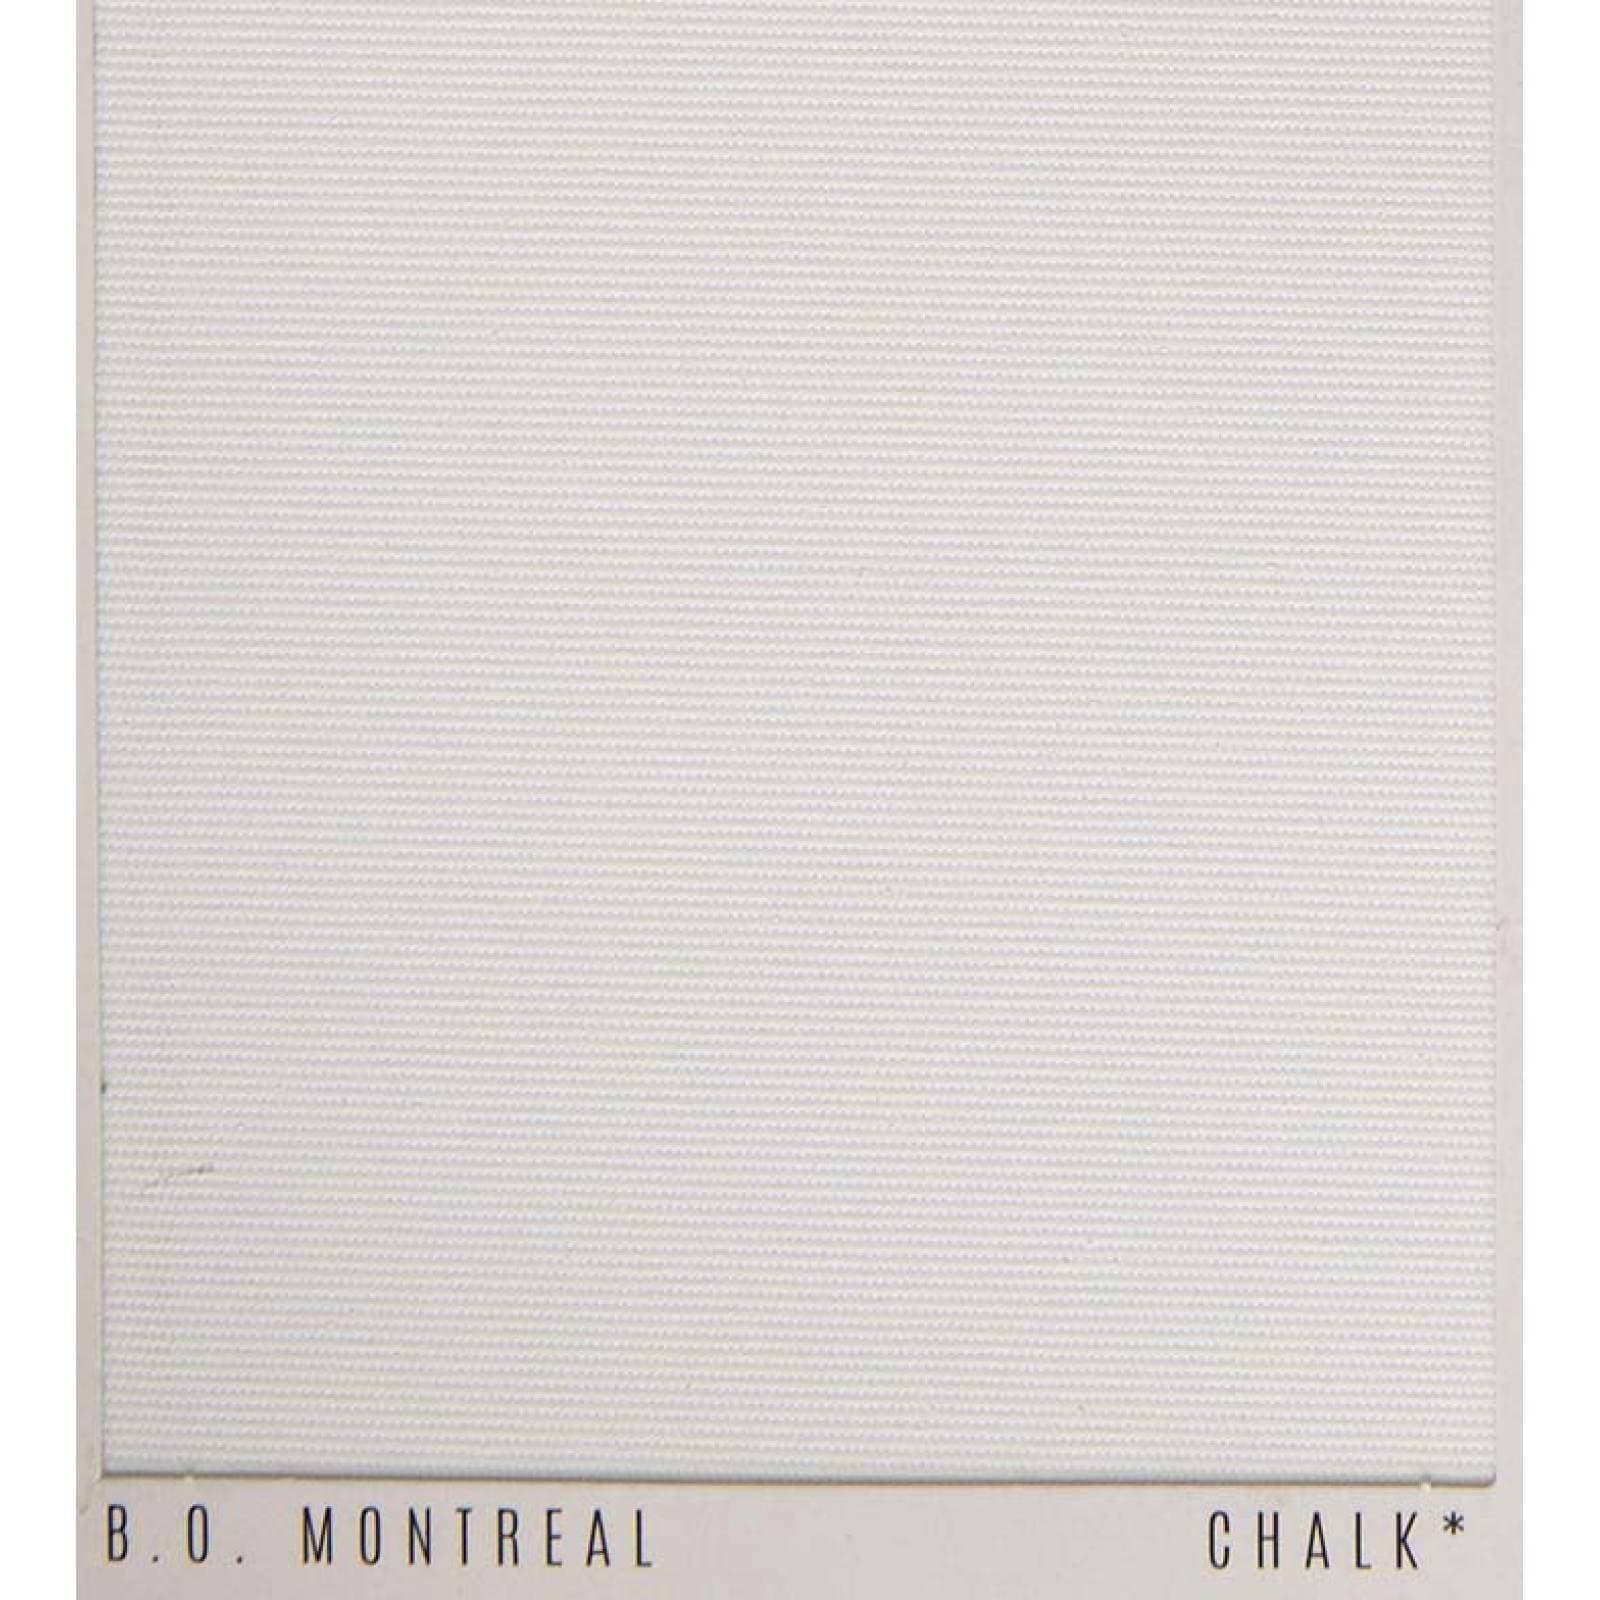 Persianas Blackout modelo Montreal 220 cm de ancho X hasta 150 cm de largo